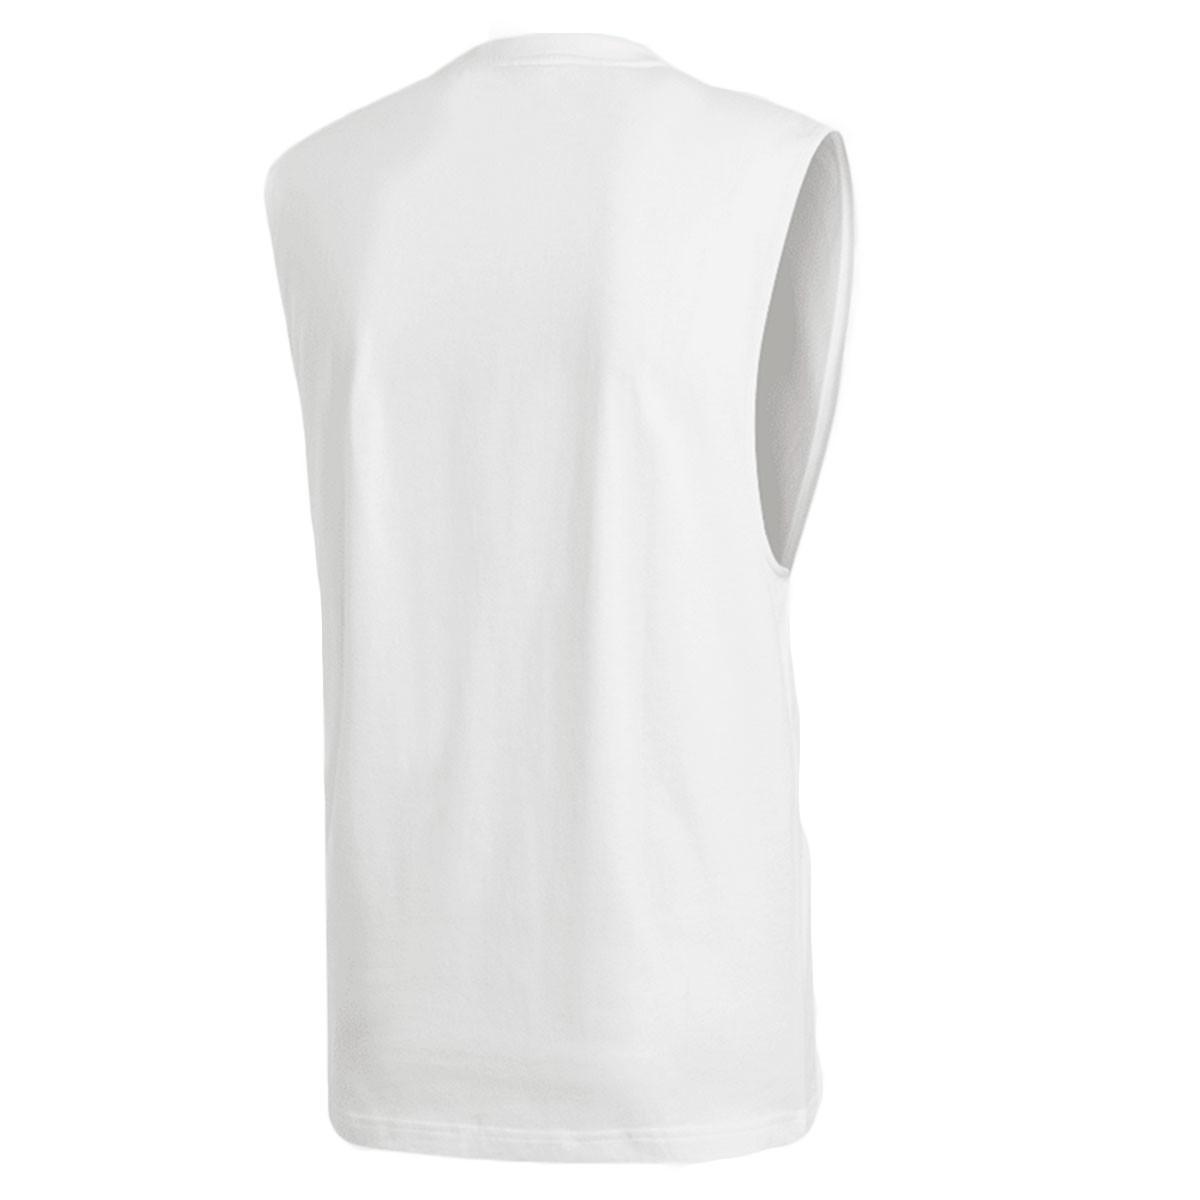 Camisa Regata Adidas MH Bos Tank Masculino - Branco